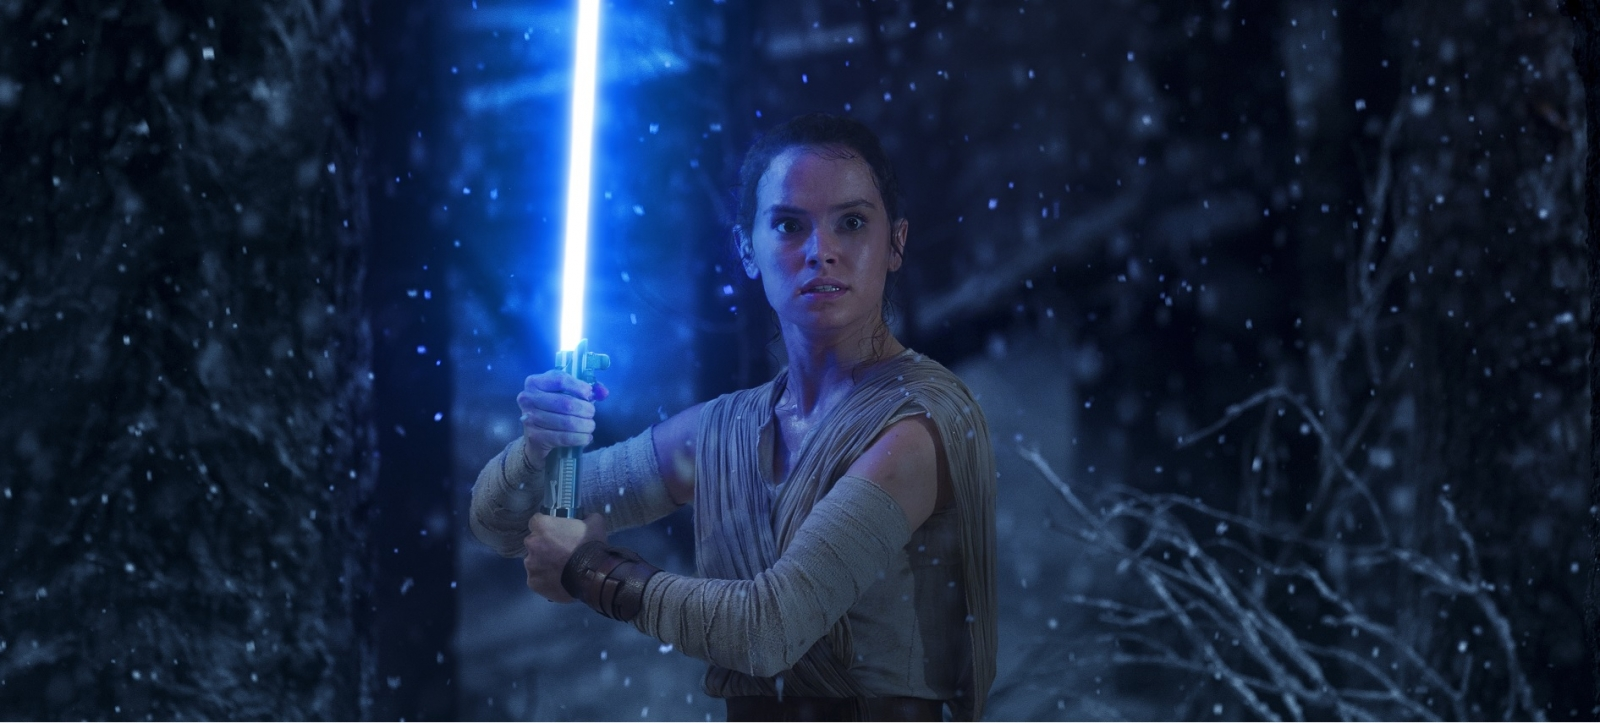 Rey in Star Wars: The Force Awakens